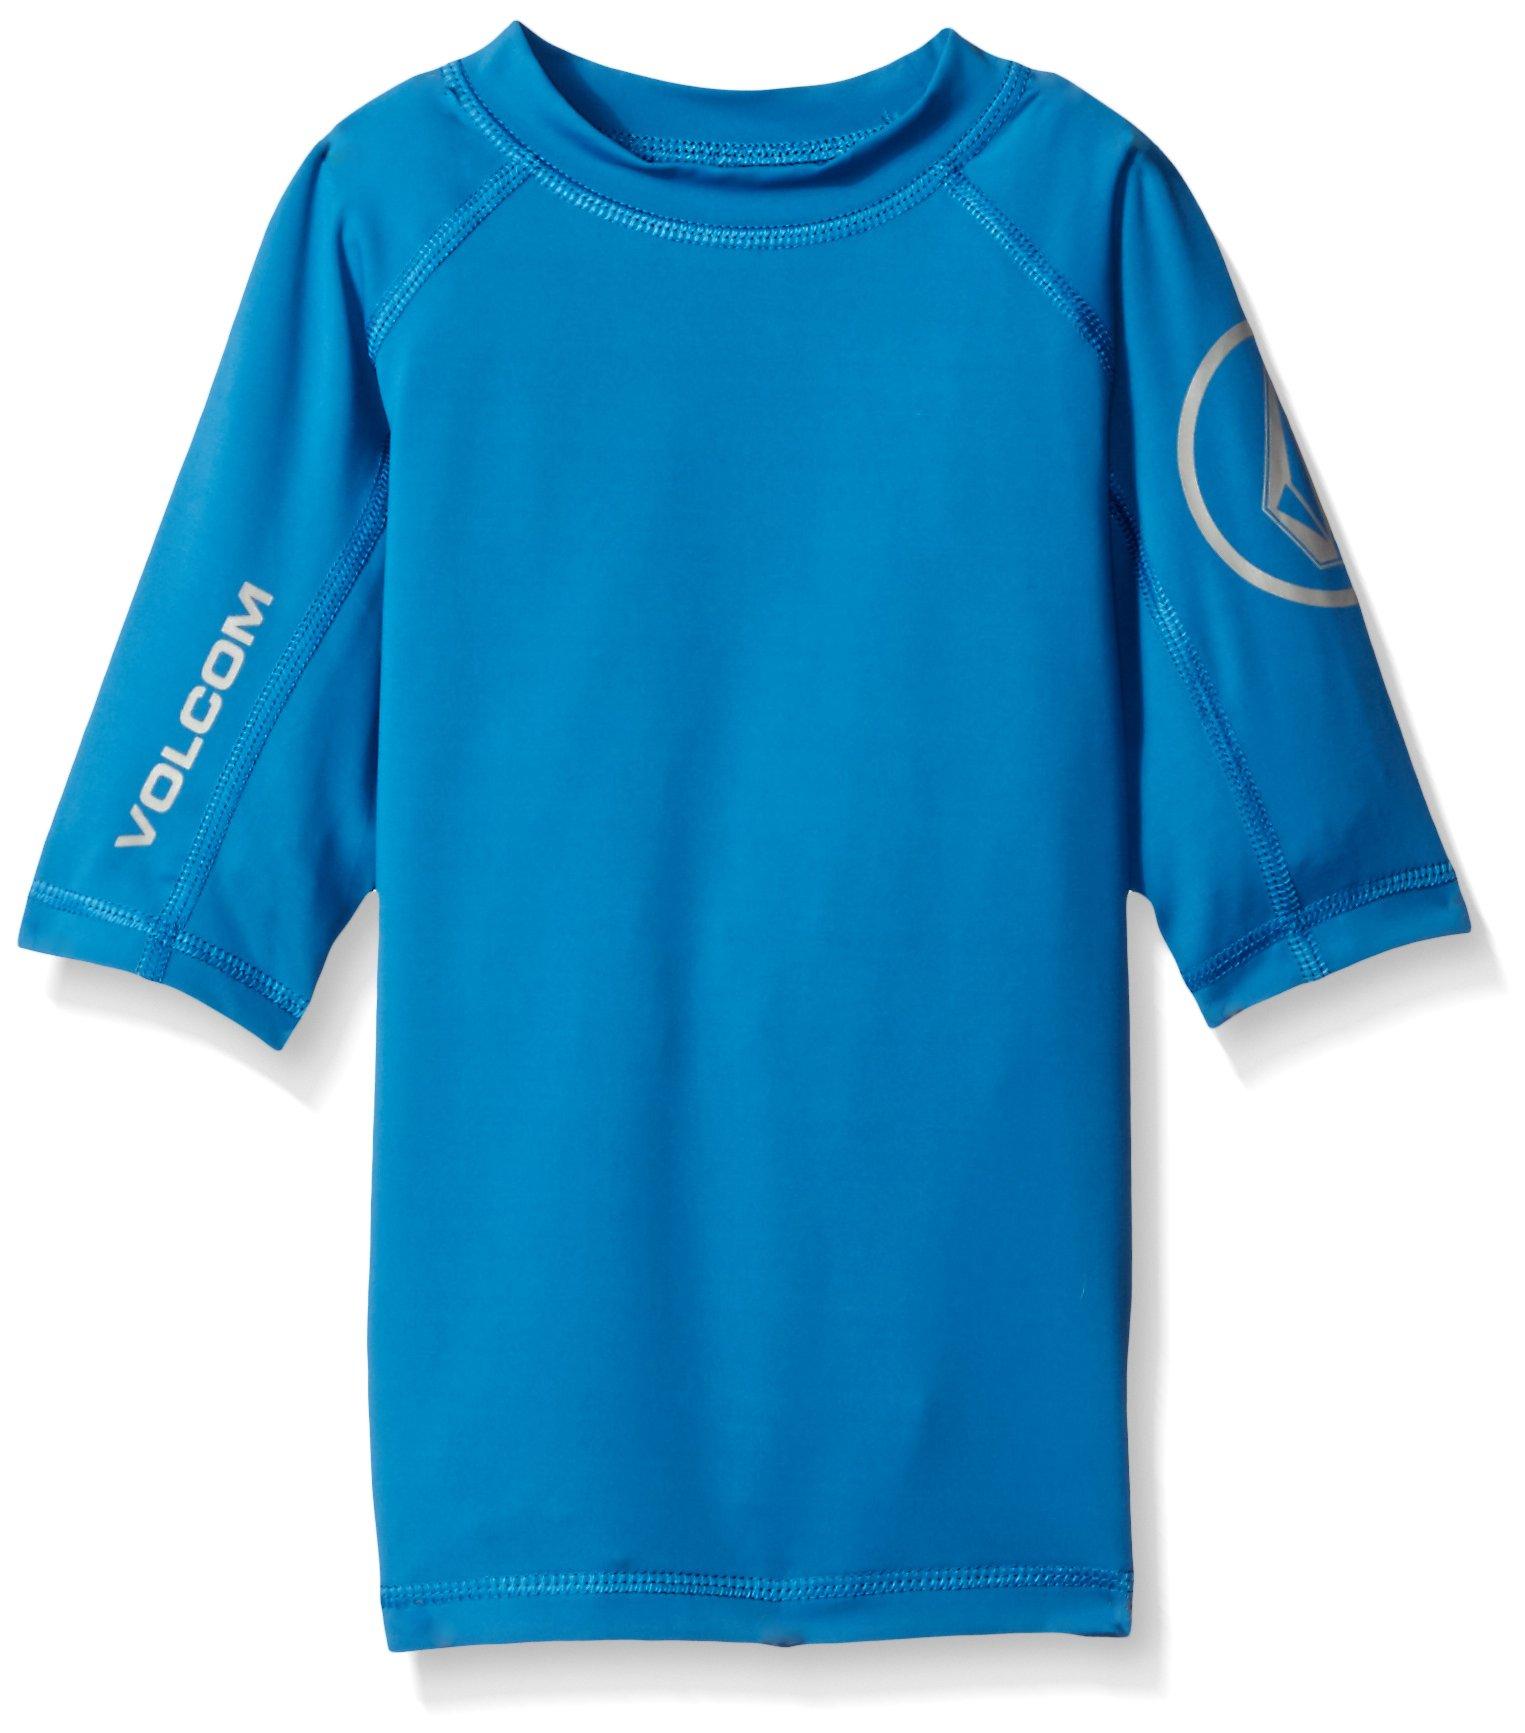 Galleon Volcom Baby Little Boys 39 Surf Shirt Rashguard